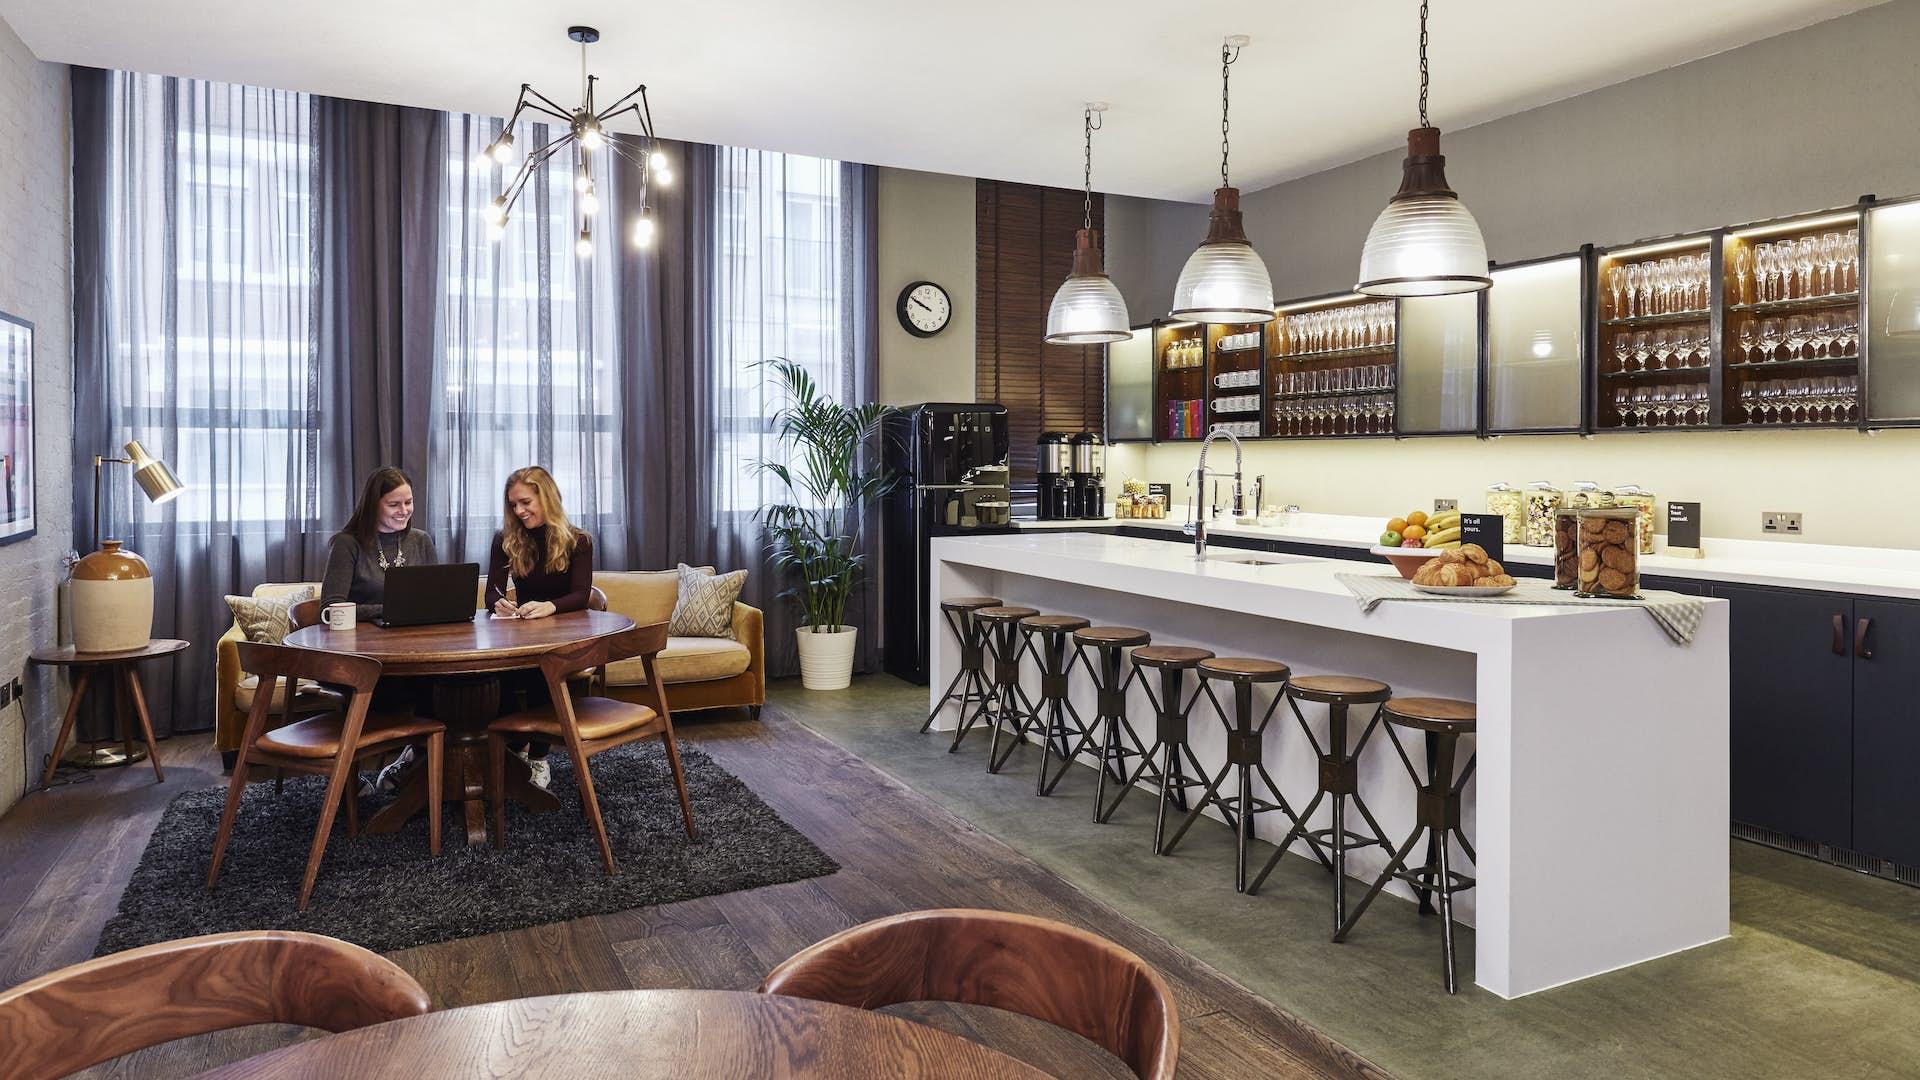 Hire E Venue The Apartment Exclusive At Hoxton Holborn